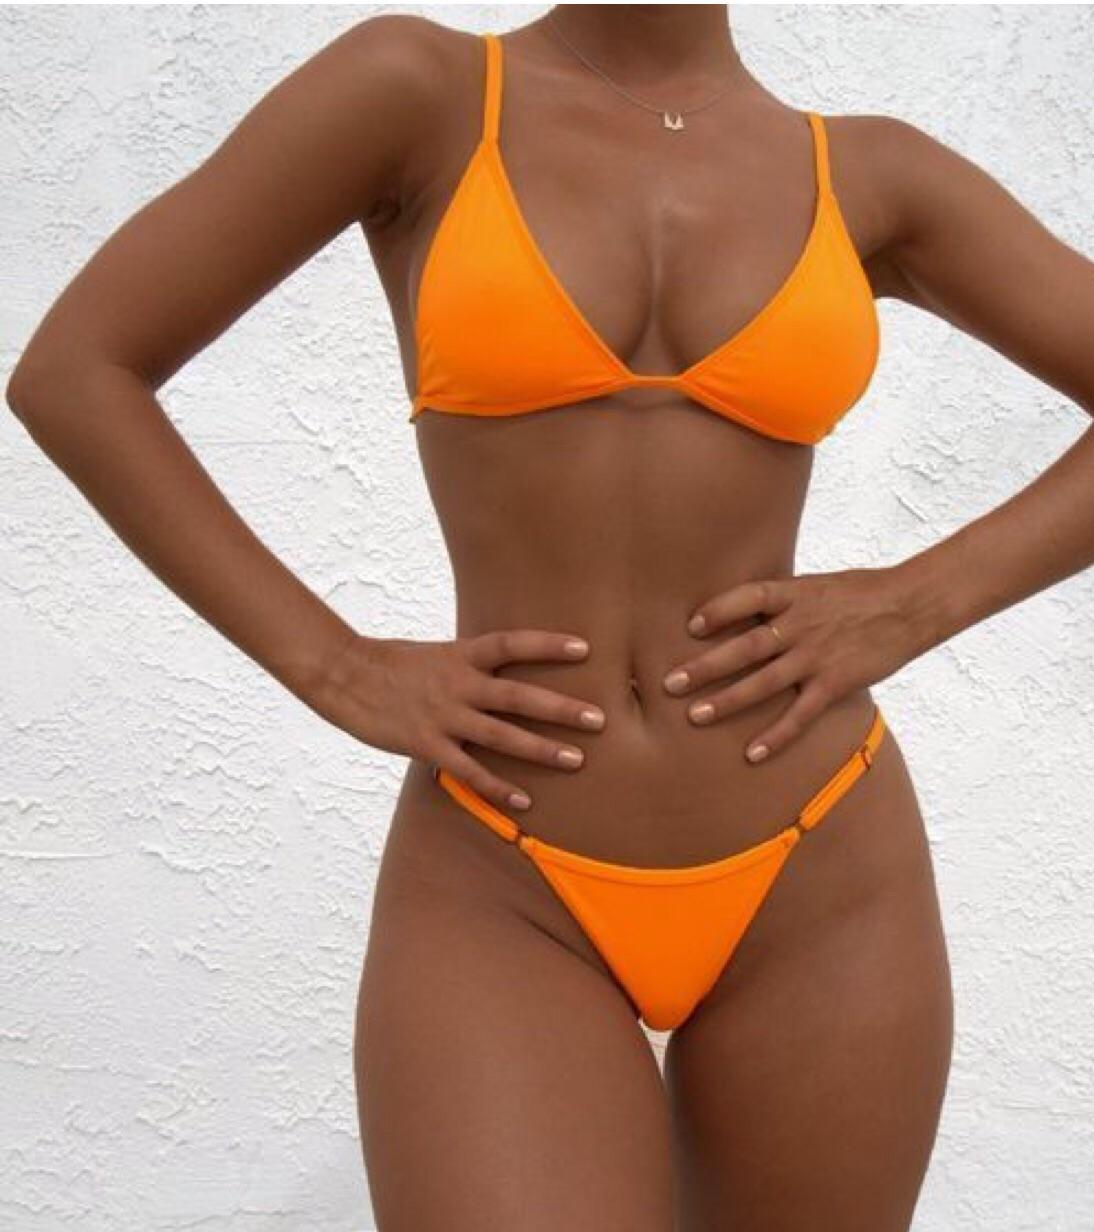 body, girl, and orange image